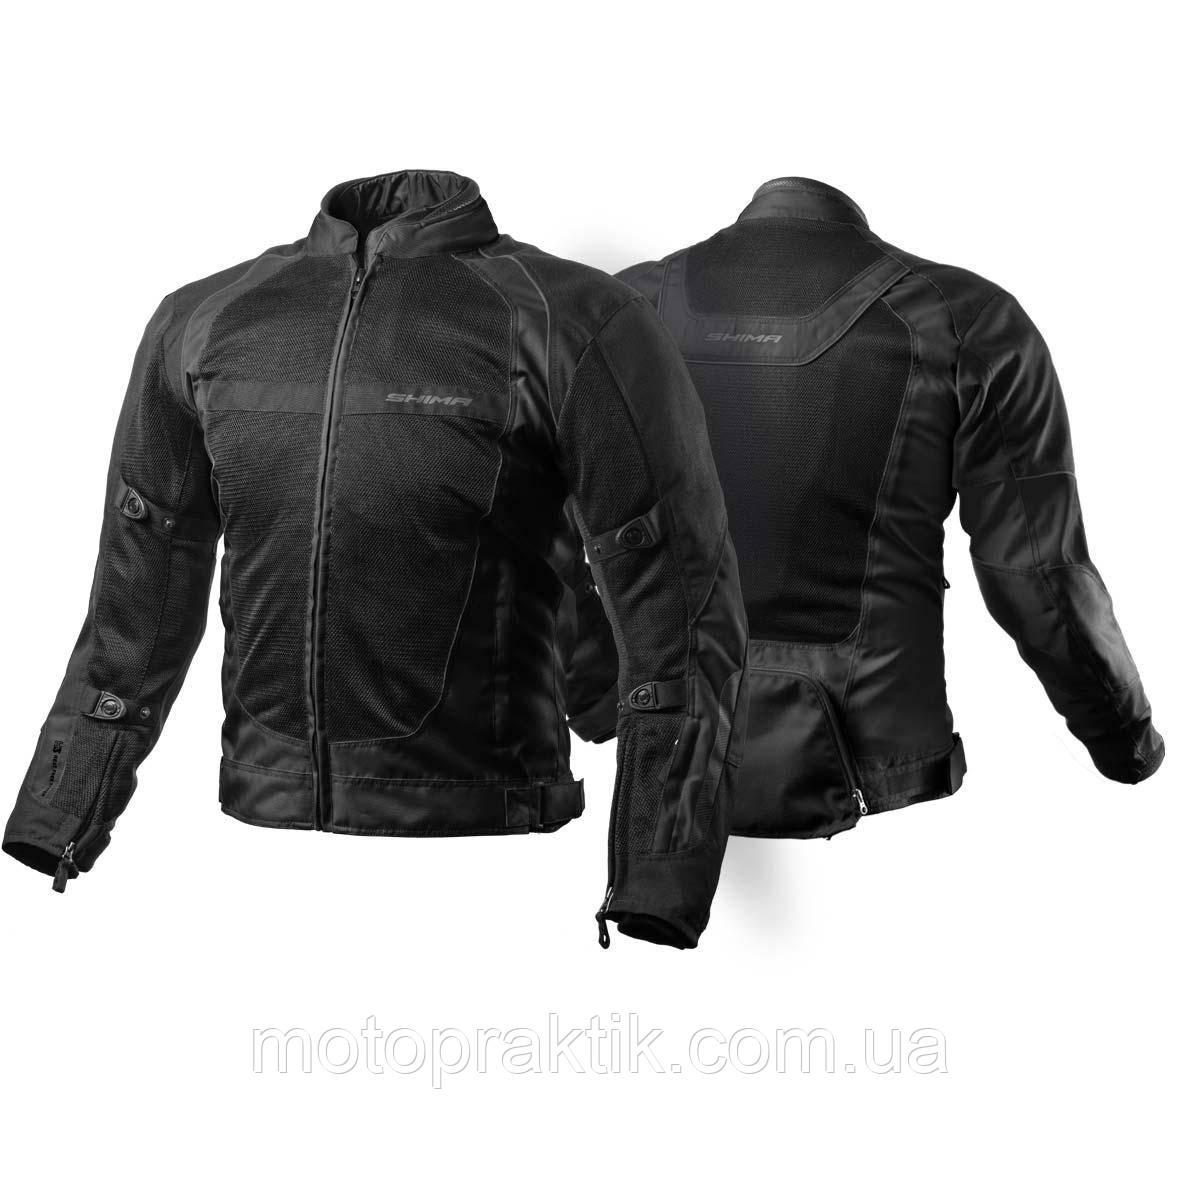 Shima X-Mash Textile Jacket, Black, S Мотокуртка текстильная летняя